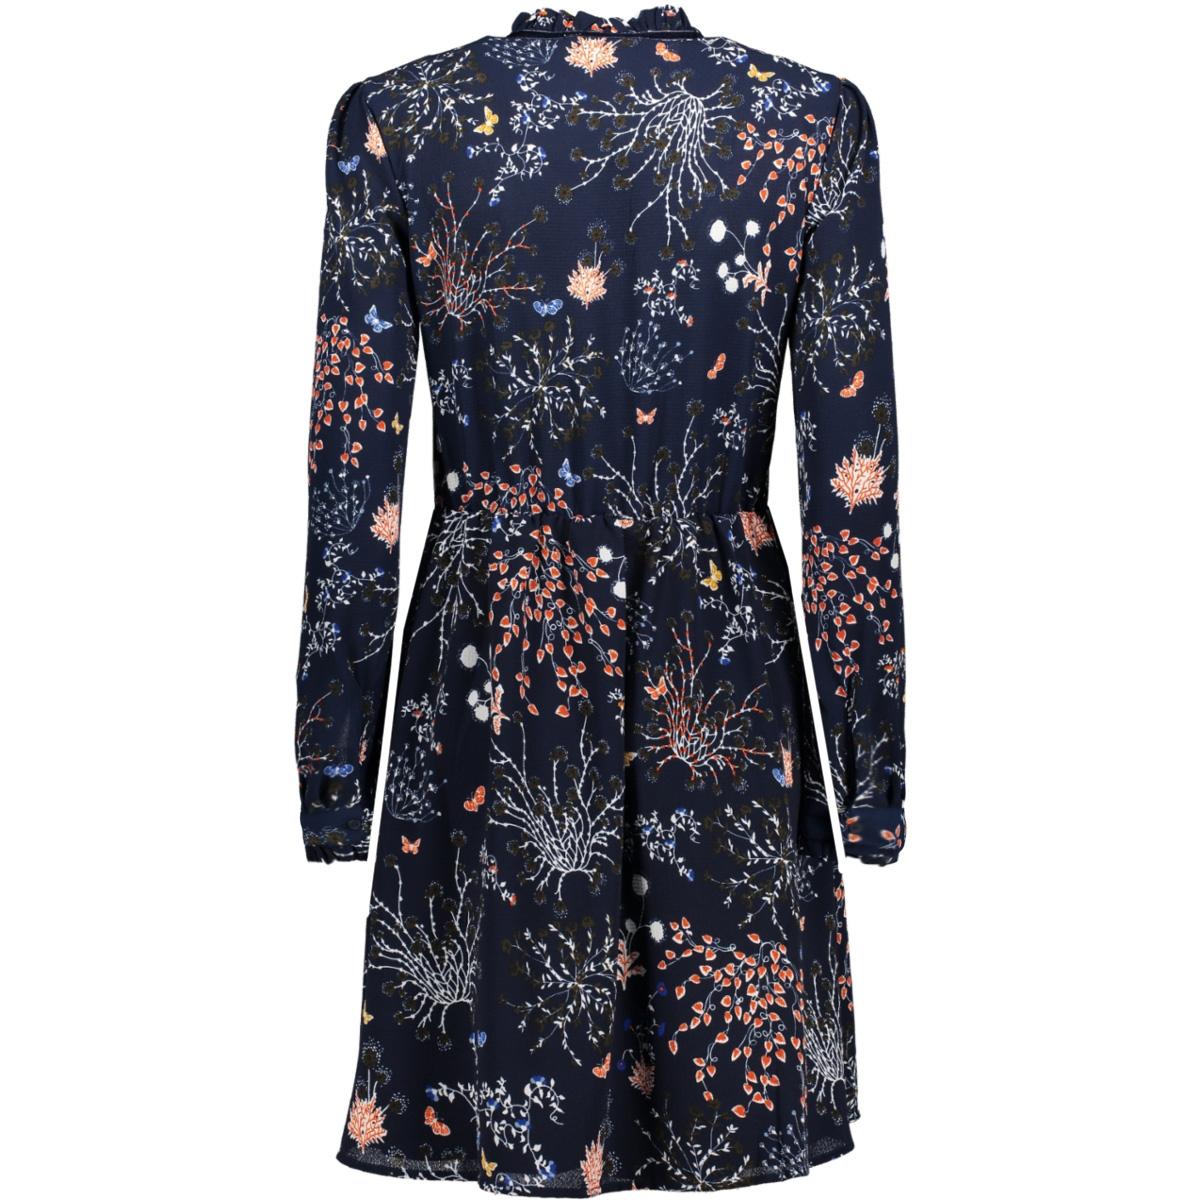 5055022.00.71 tom tailor jurk 1003